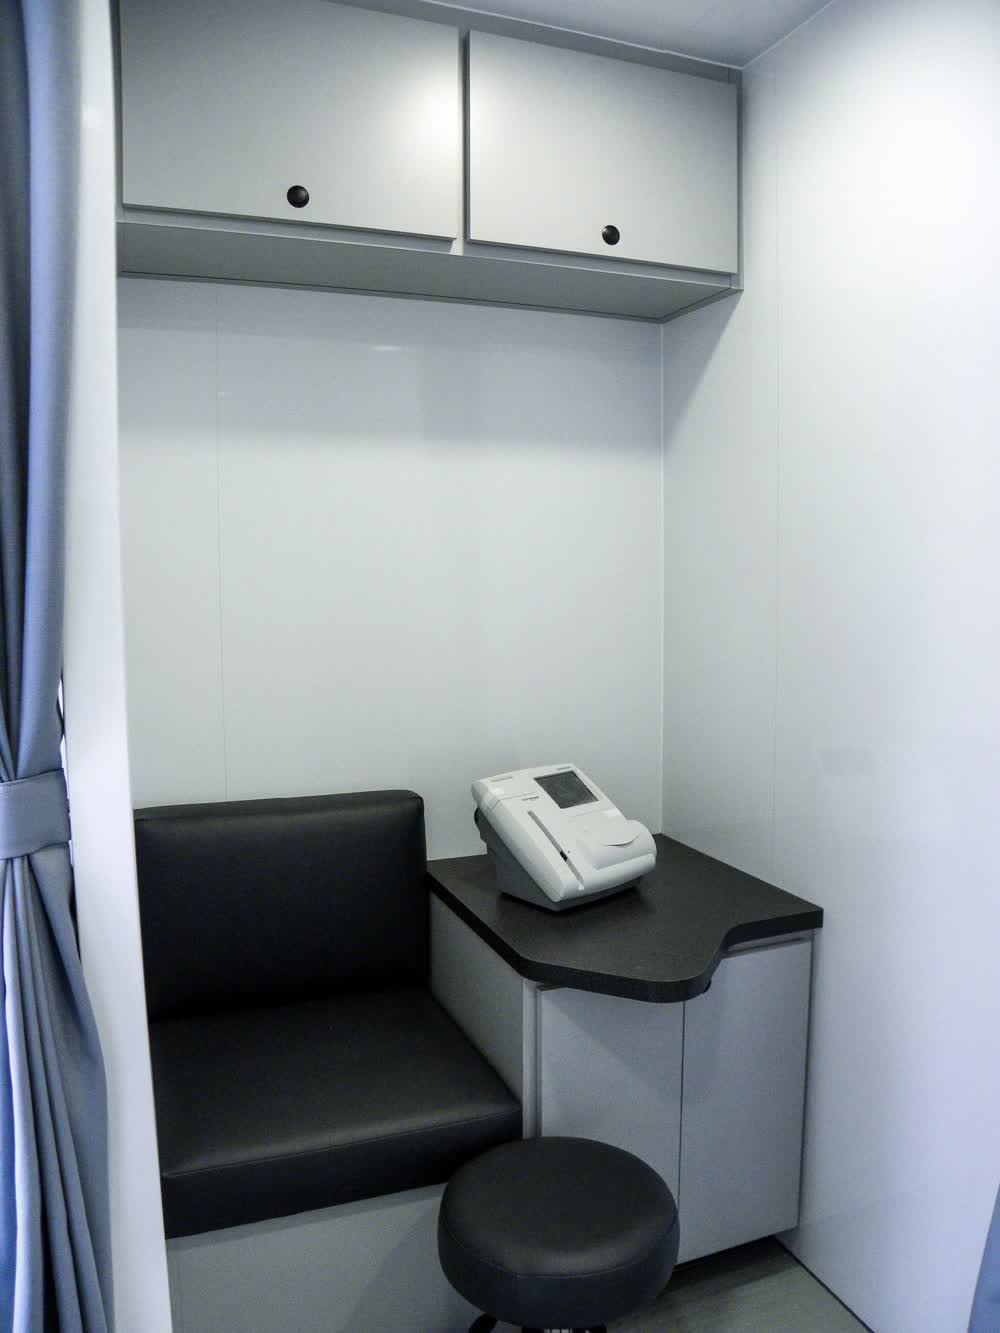 diabetes mobile medical trailer